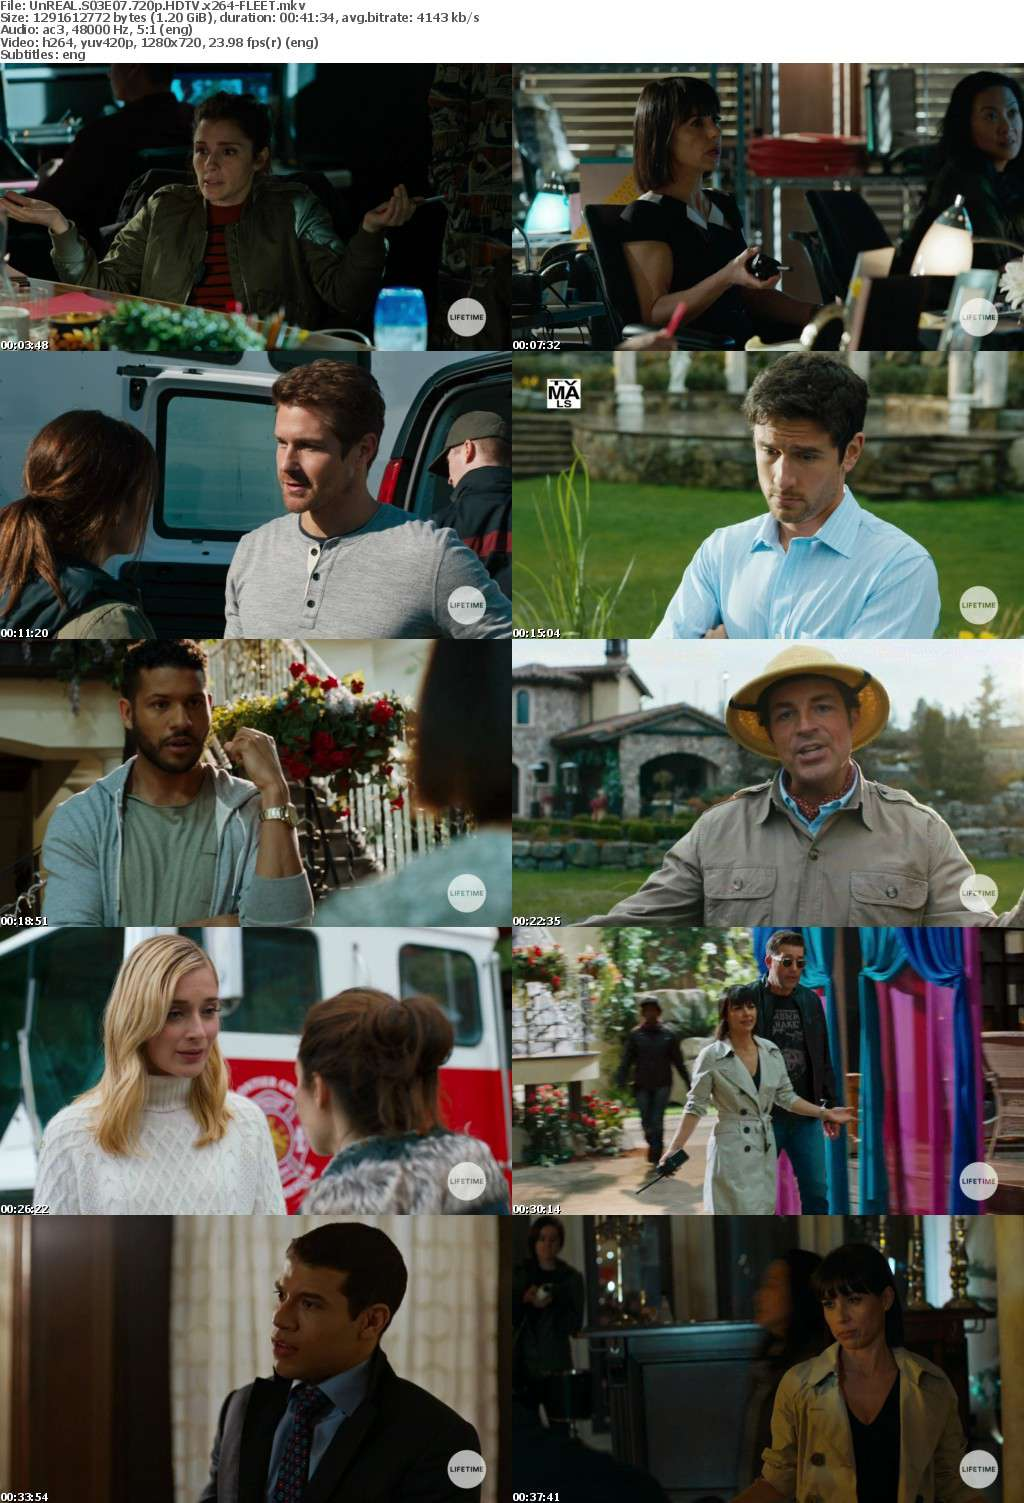 UnREAL S03E07 720p HDTV x264-FLEET